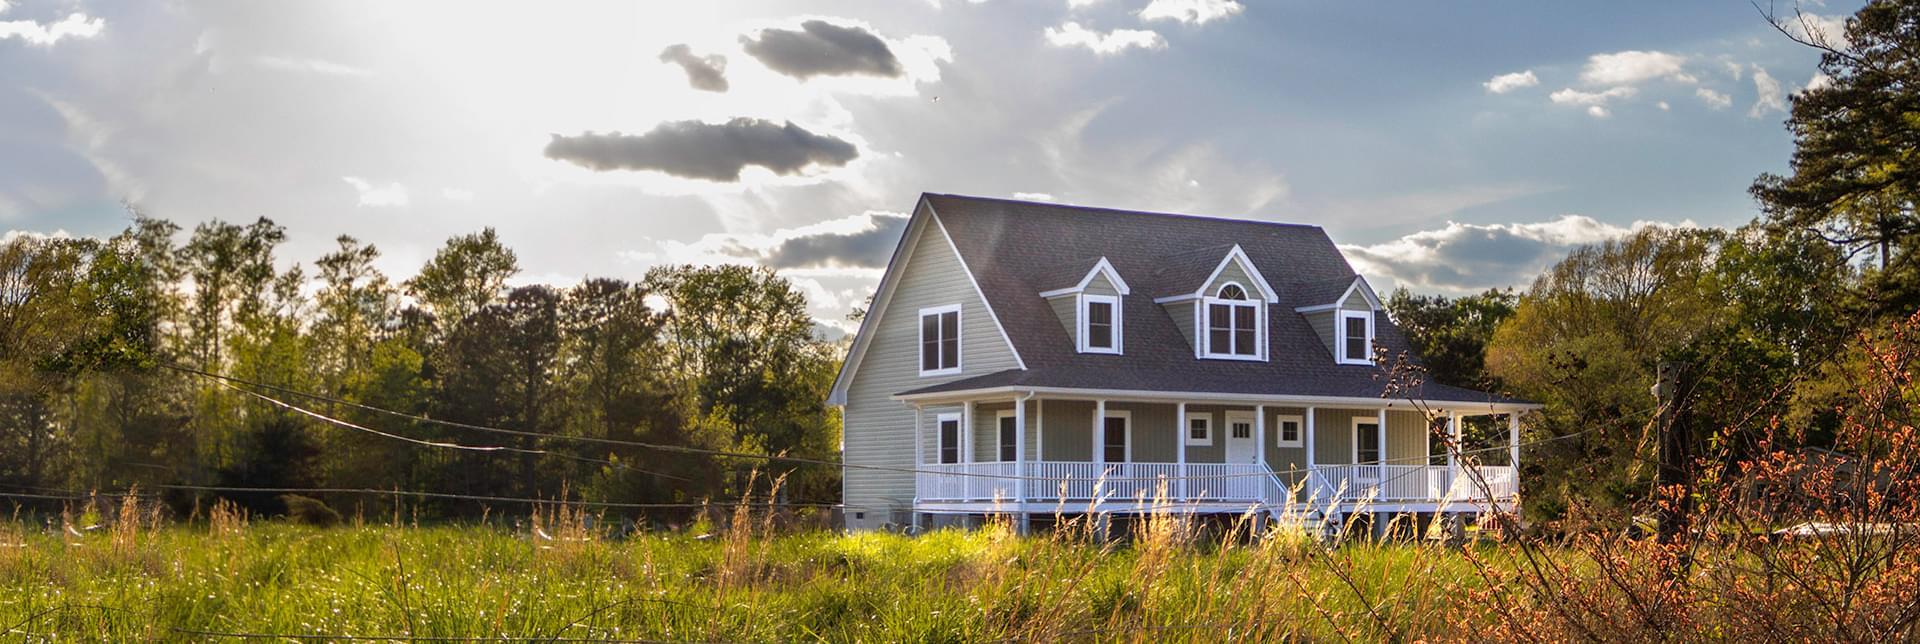 New Homes in Fauquier County VA